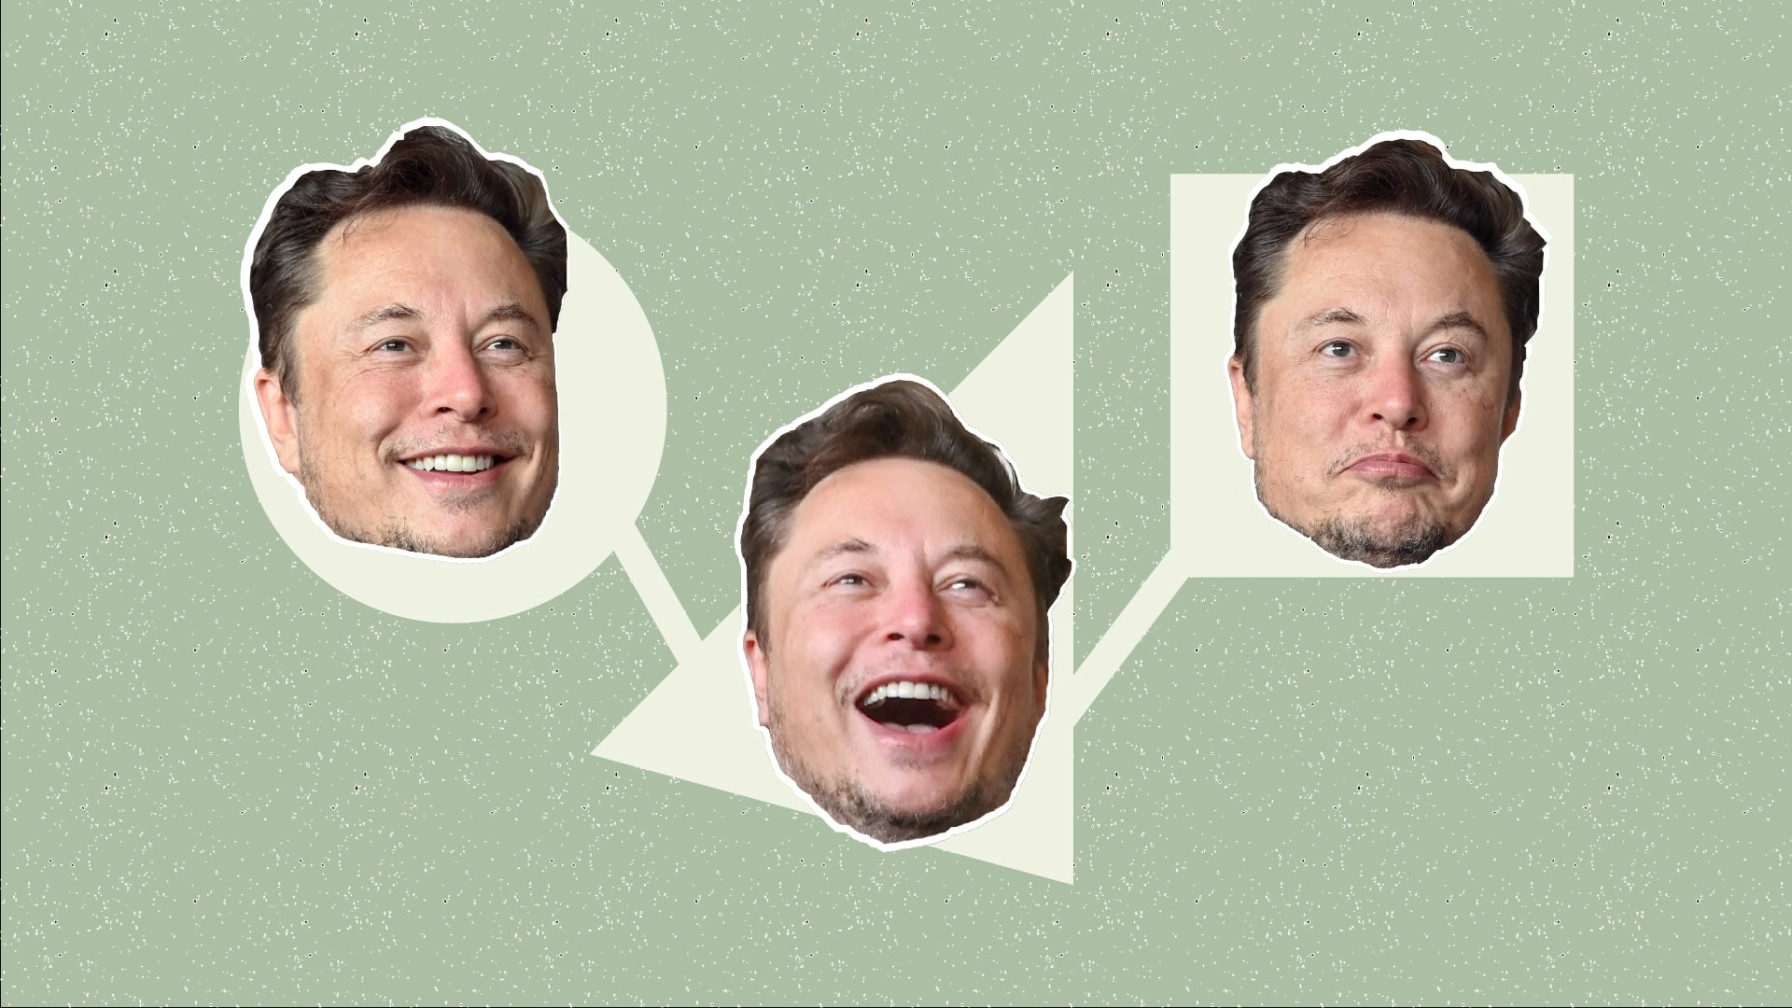 Elon Musk's faces